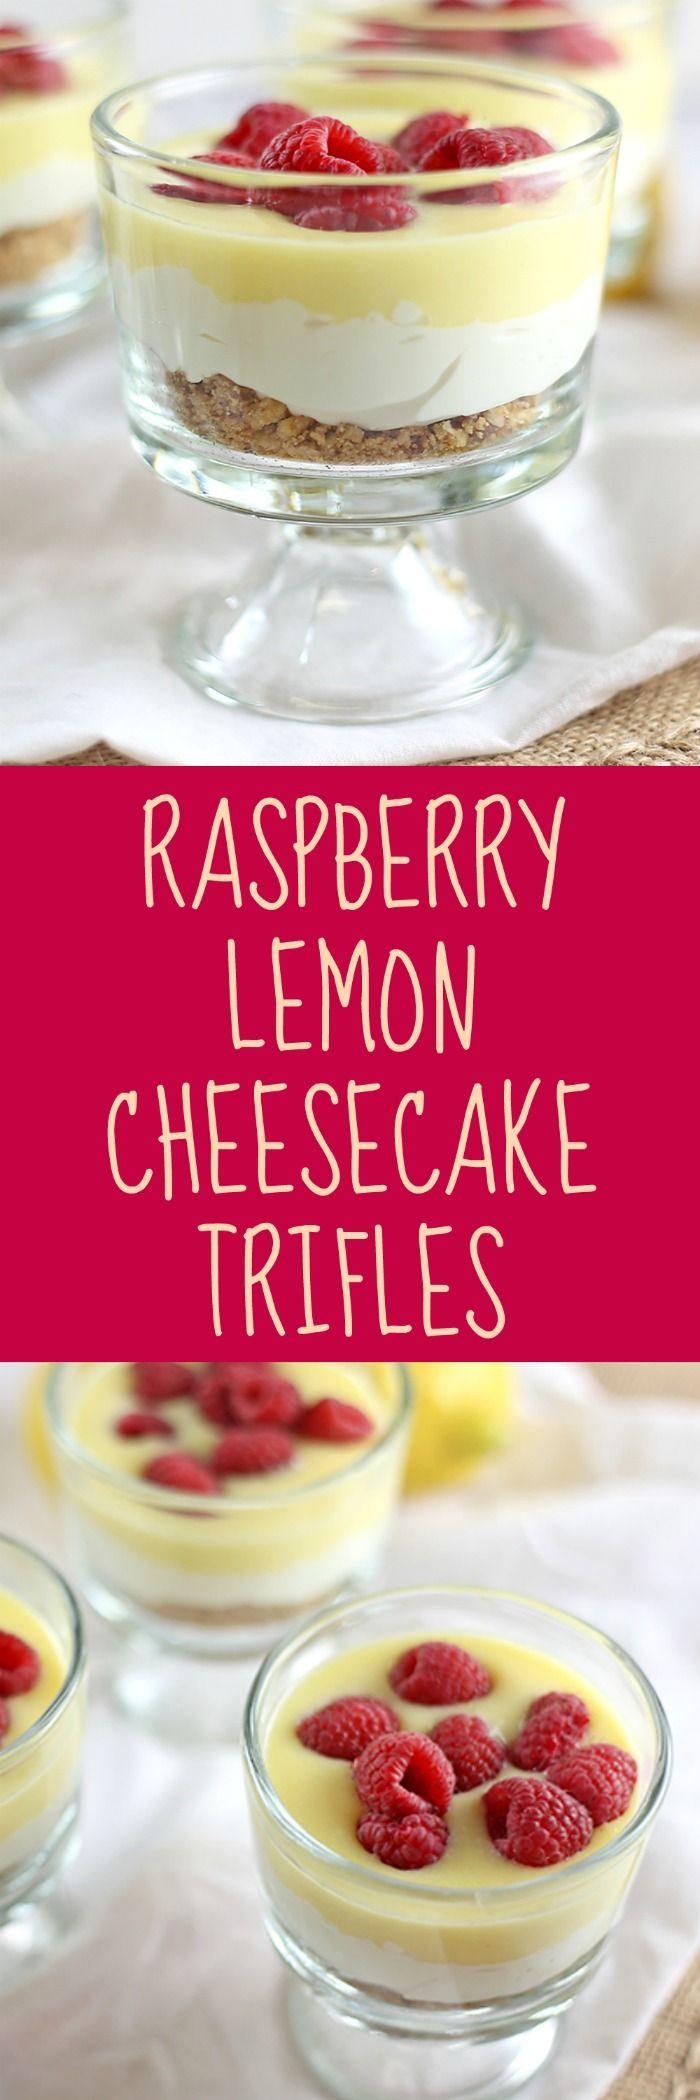 Raspberry Lemon Cheesecake Trifles are bursting with flavor & texture, sweet & tart, crunchy & creamy! Made with @Splenda! Click over to RoseBakes.com for the recipe.  #SplendaSweeties #SweetSwaps #ad